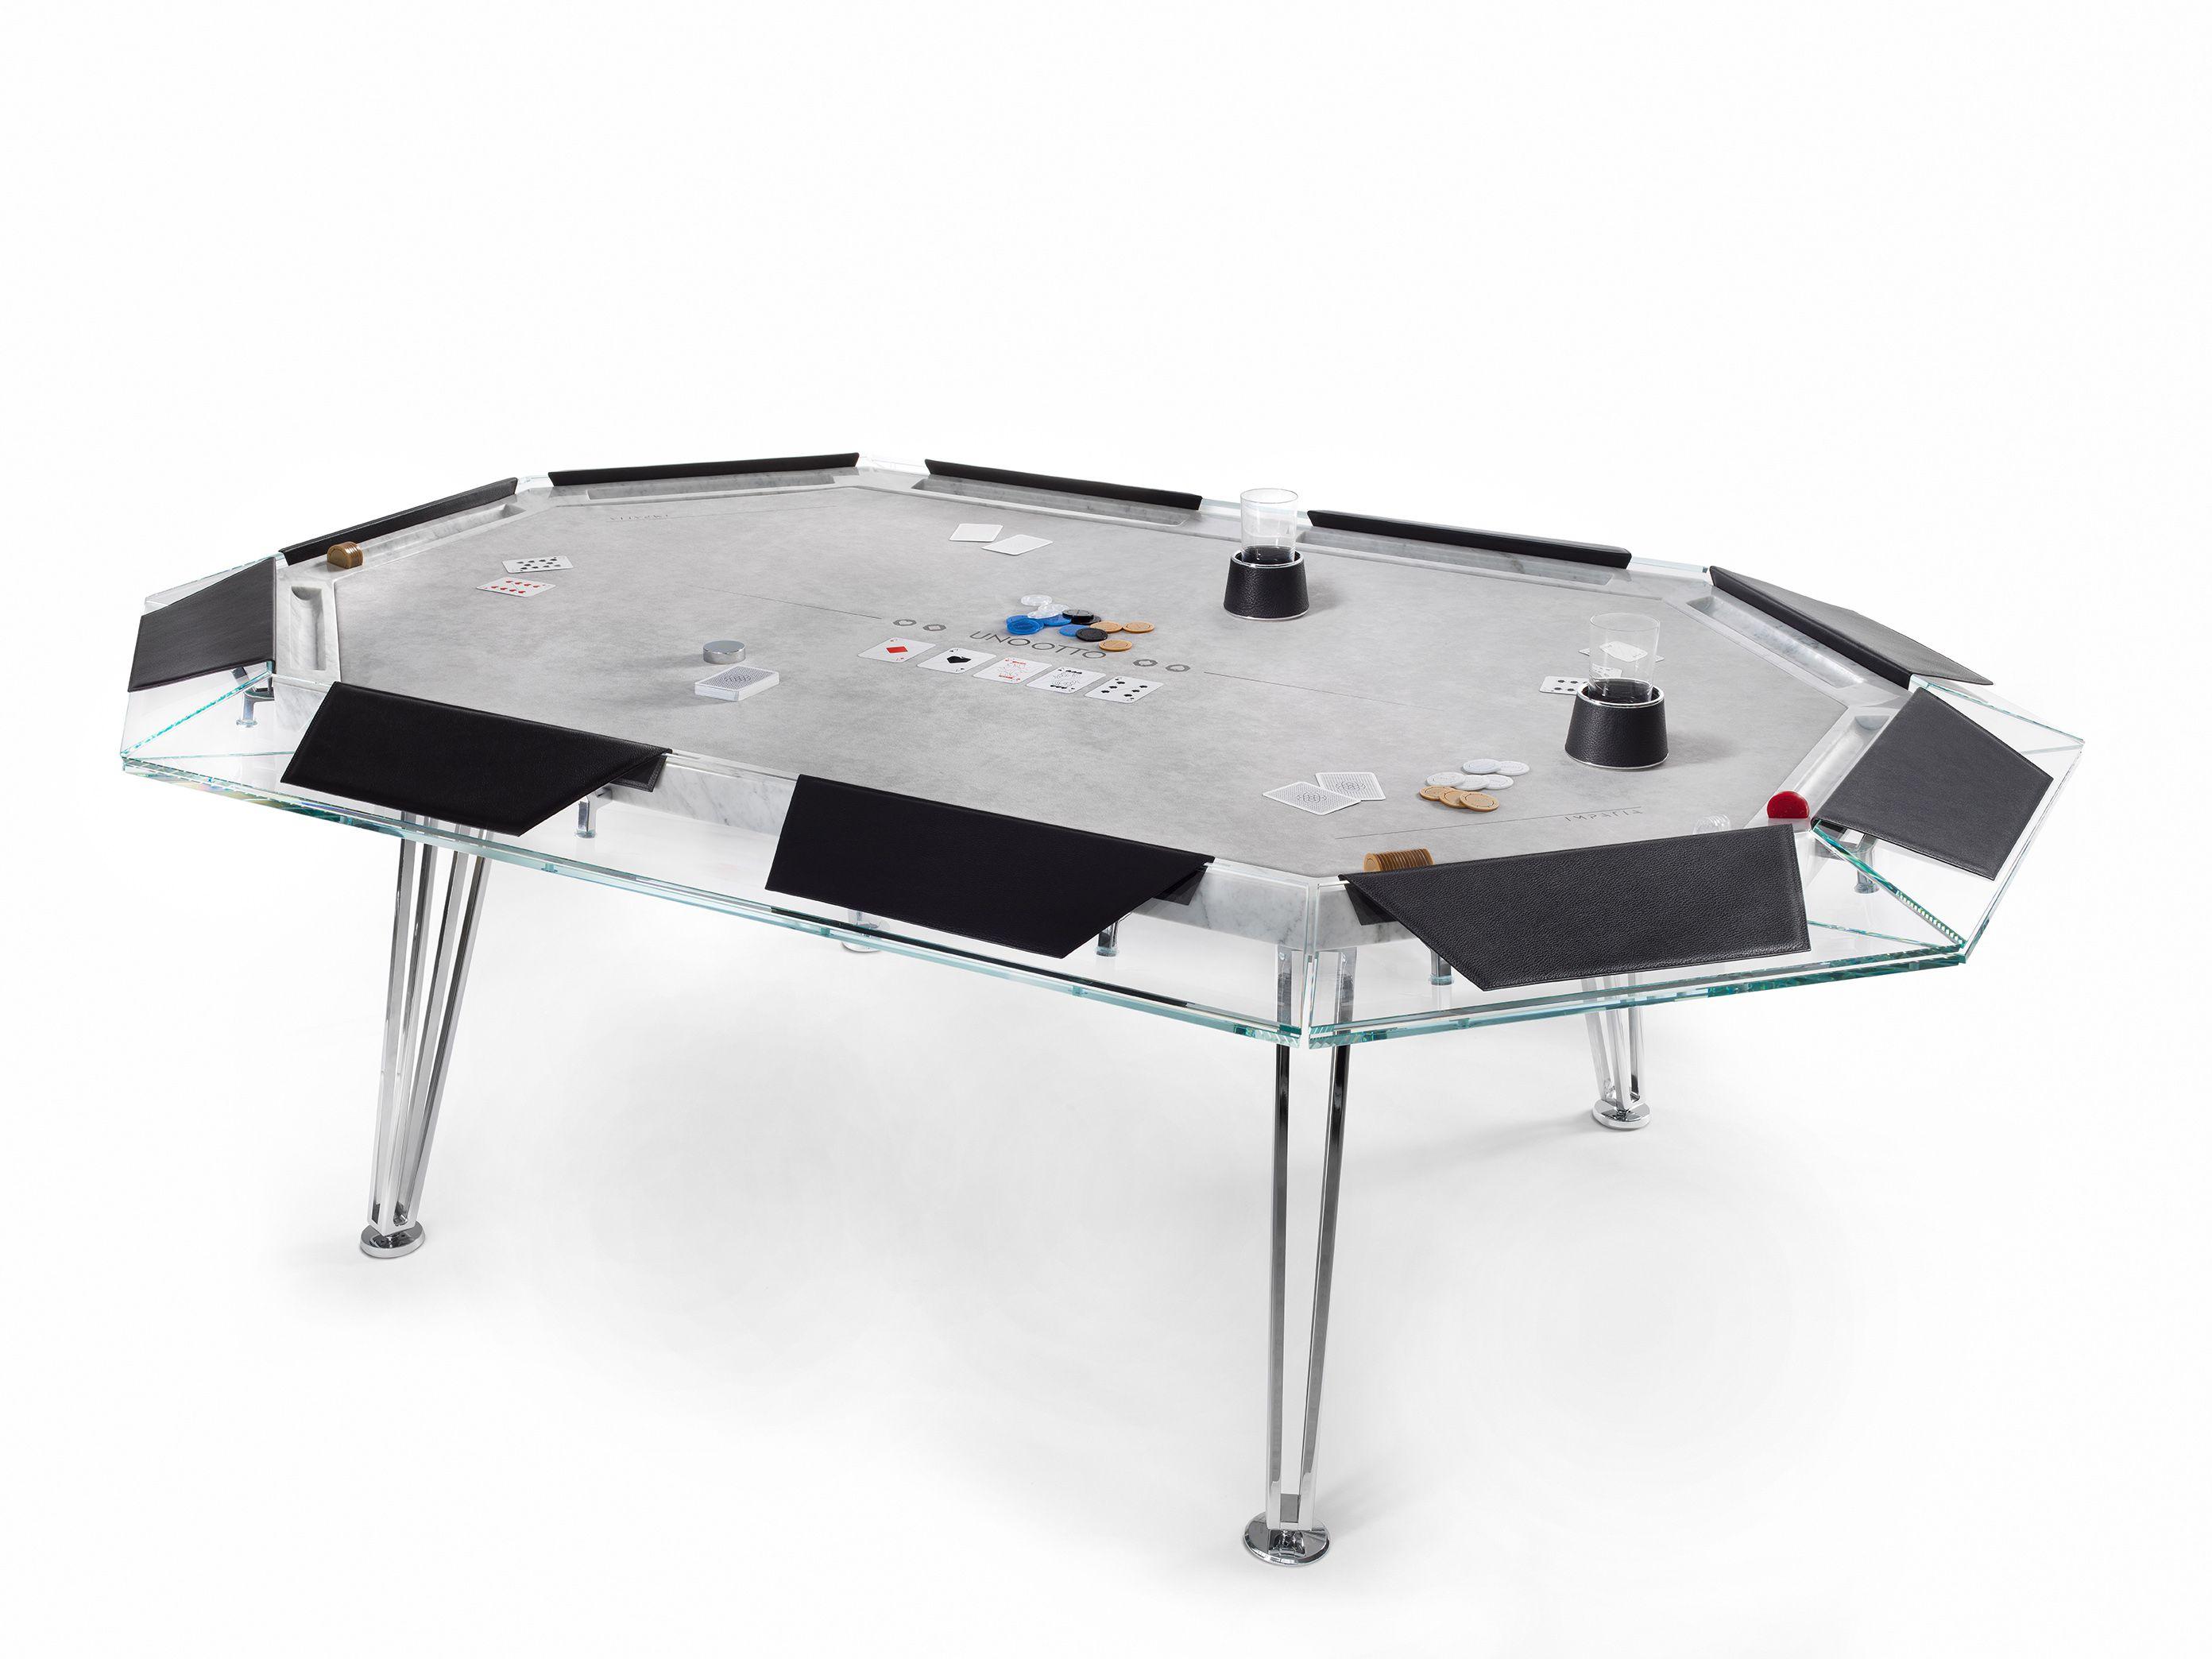 10 Person Bespoke Poker Table Impatia Luxury Poker Pokertable Casino Interiordesign Gameroom Game Room Decor Poker Table Table Games